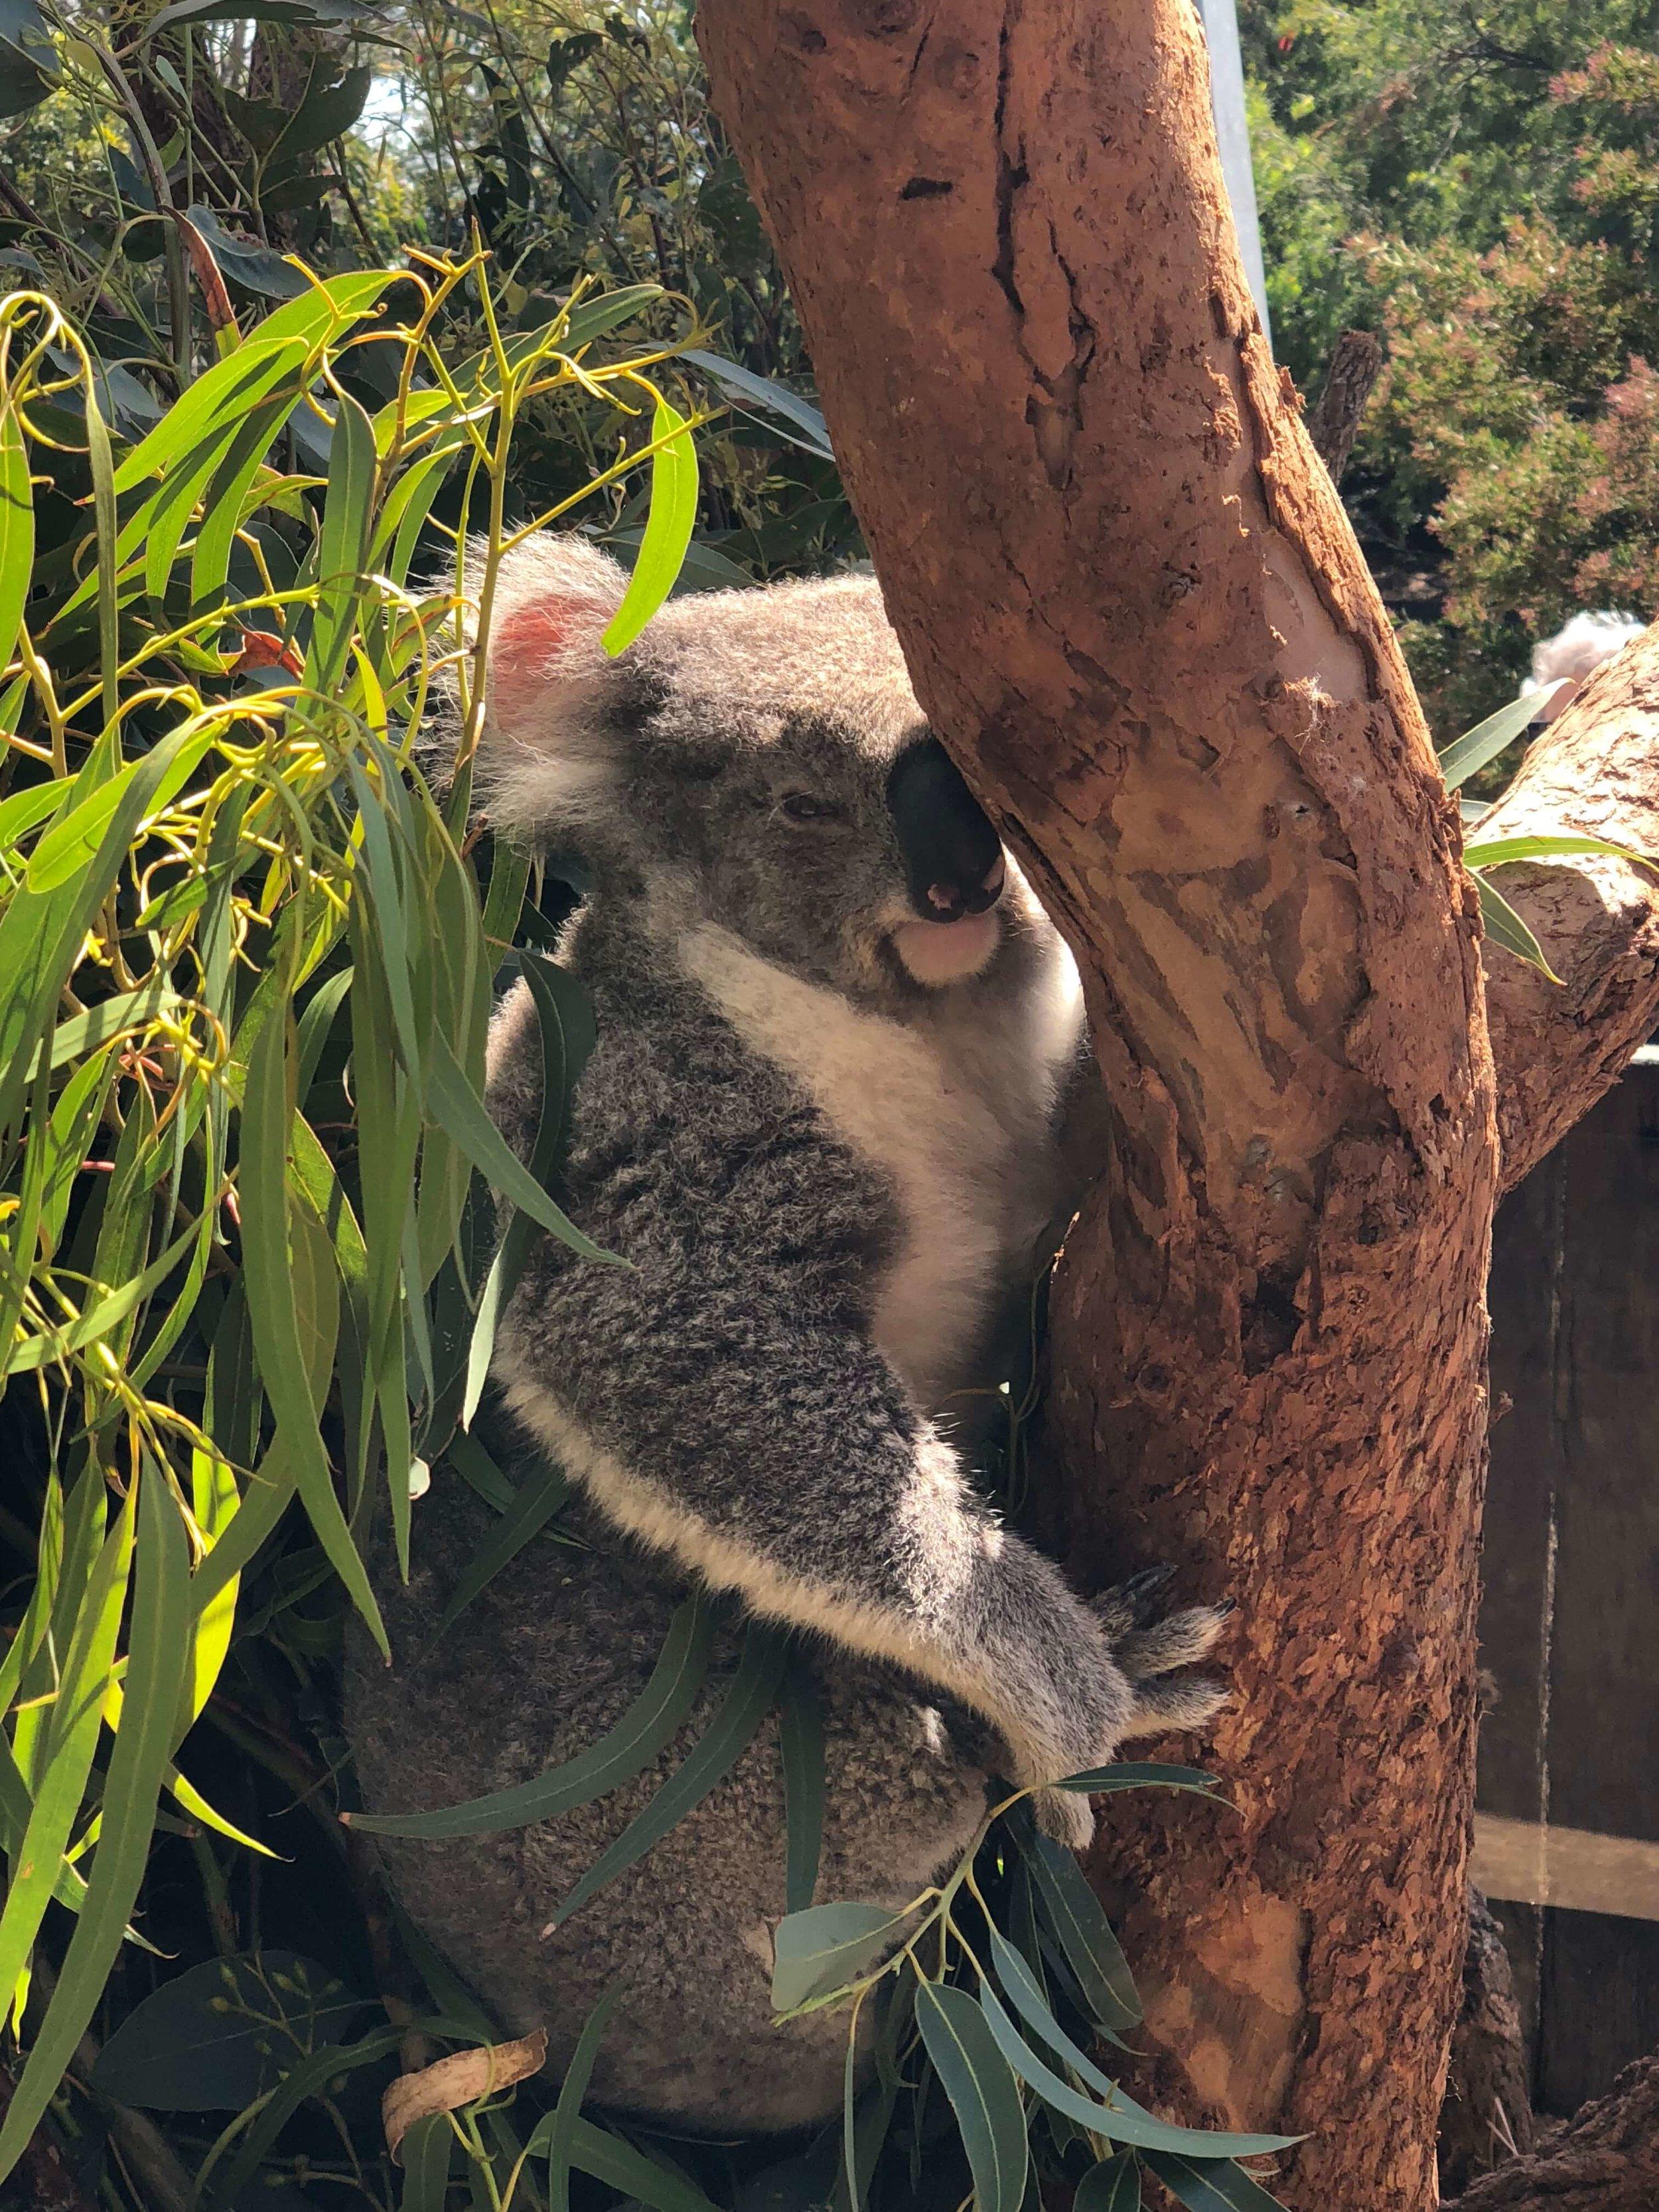 Royal koalas at Taronga Zoo